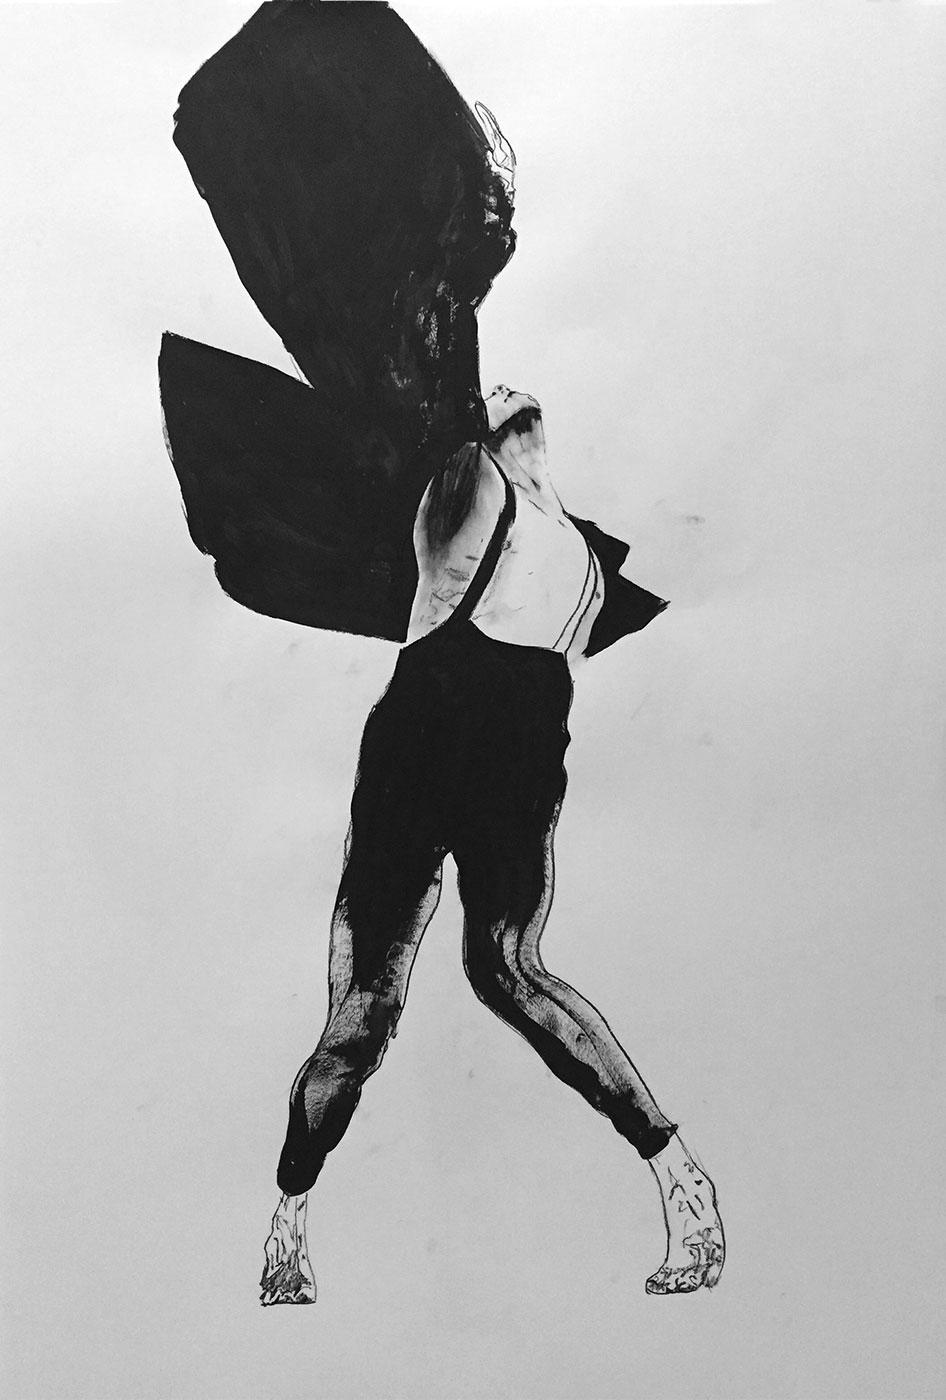 Mais-Sundermann_Tänzer#1_Kohle,-Acryl-auf-Papier_70x100cm.jpg